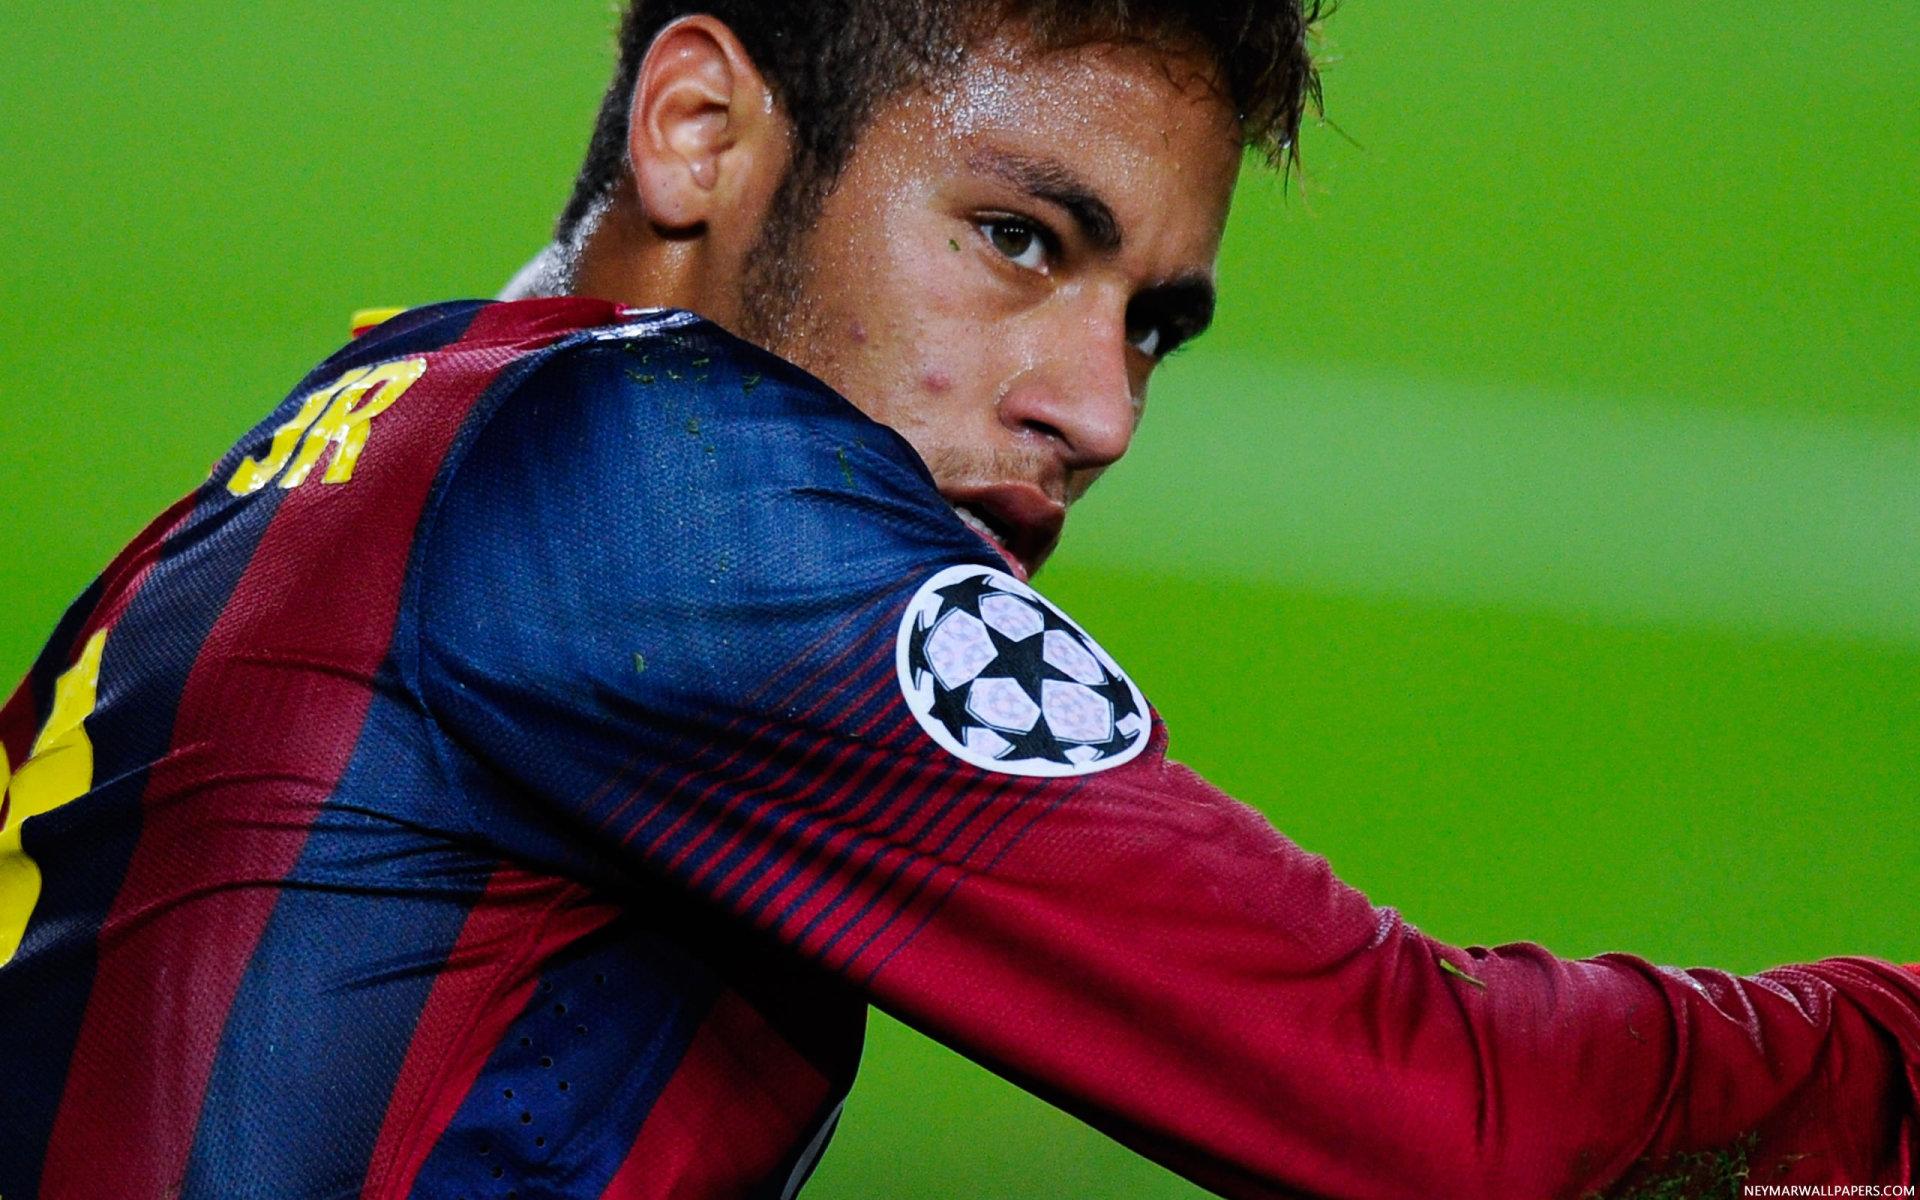 Neymar on grass Barcelona wallpaper - Neymar Wallpapers